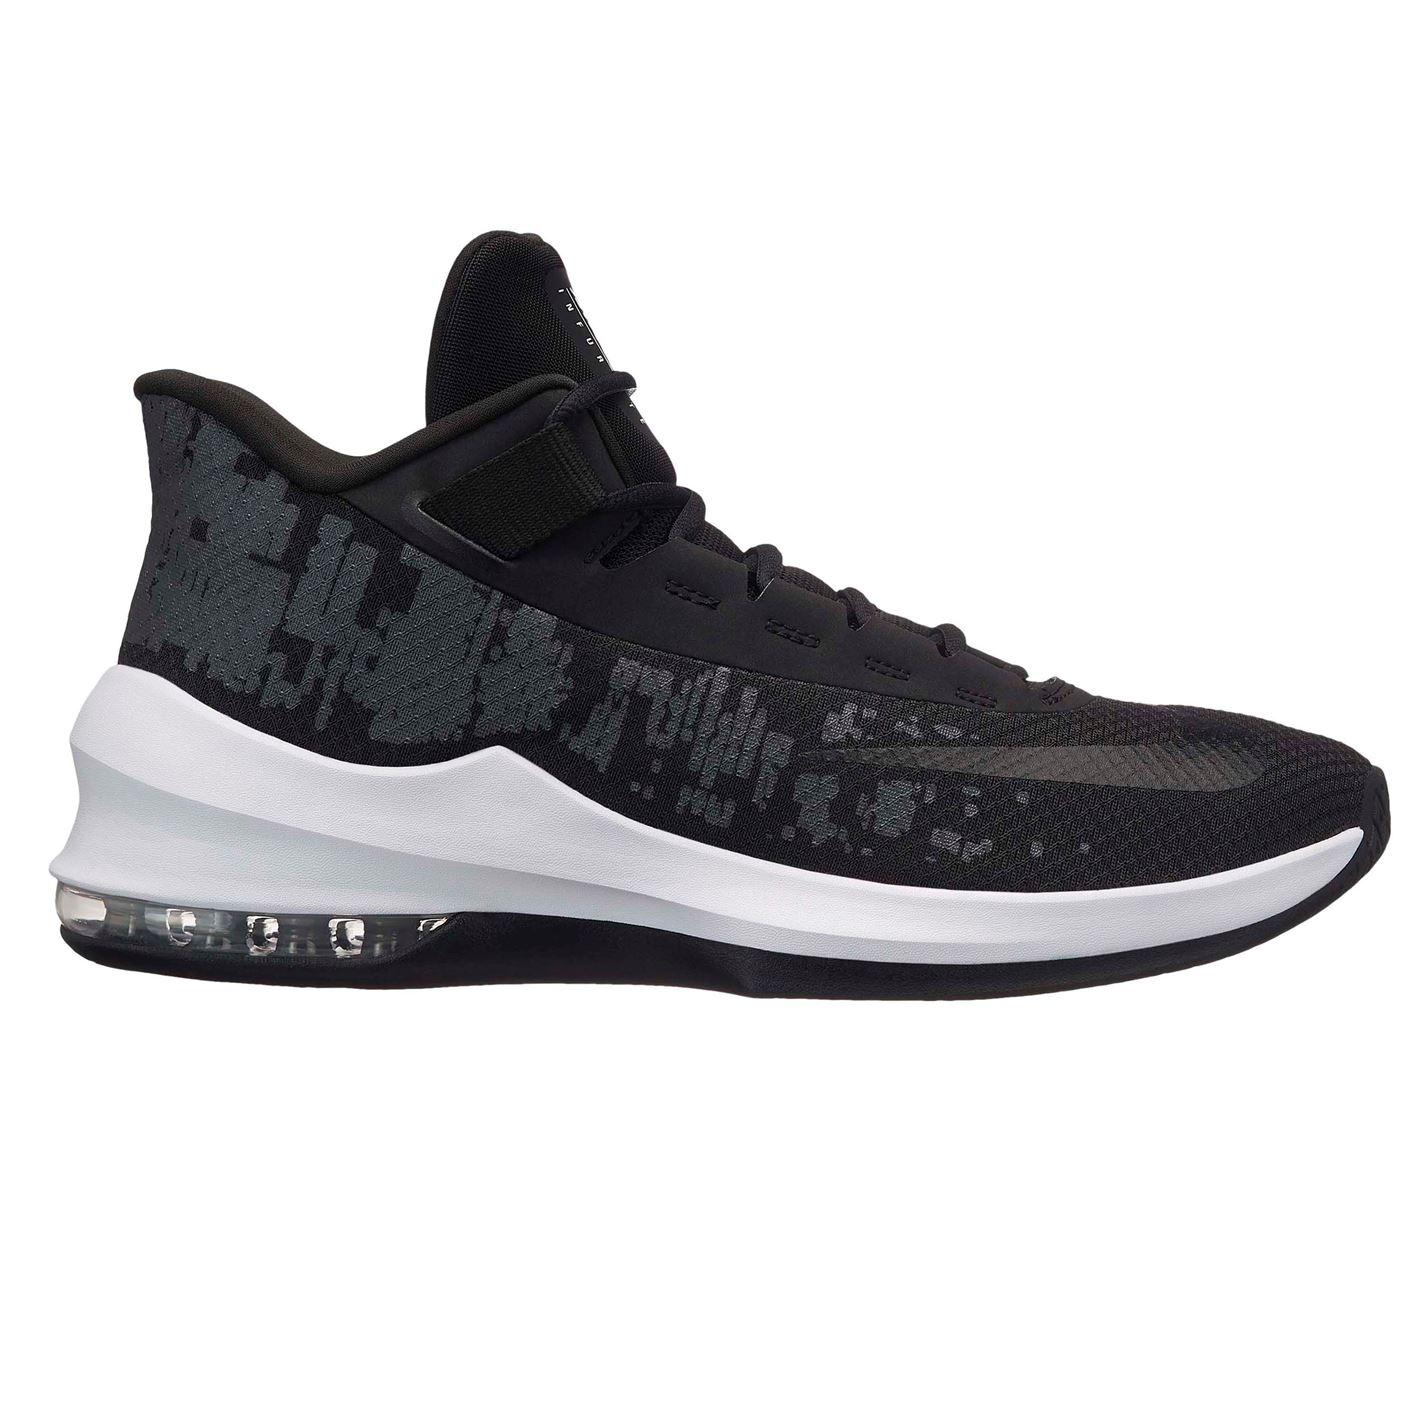 basketbalové boty boty Nike Air Max Infuriate 2 pánské Basketball  Black Black Wht. basketbalové boty ... 3cbe521c0ad